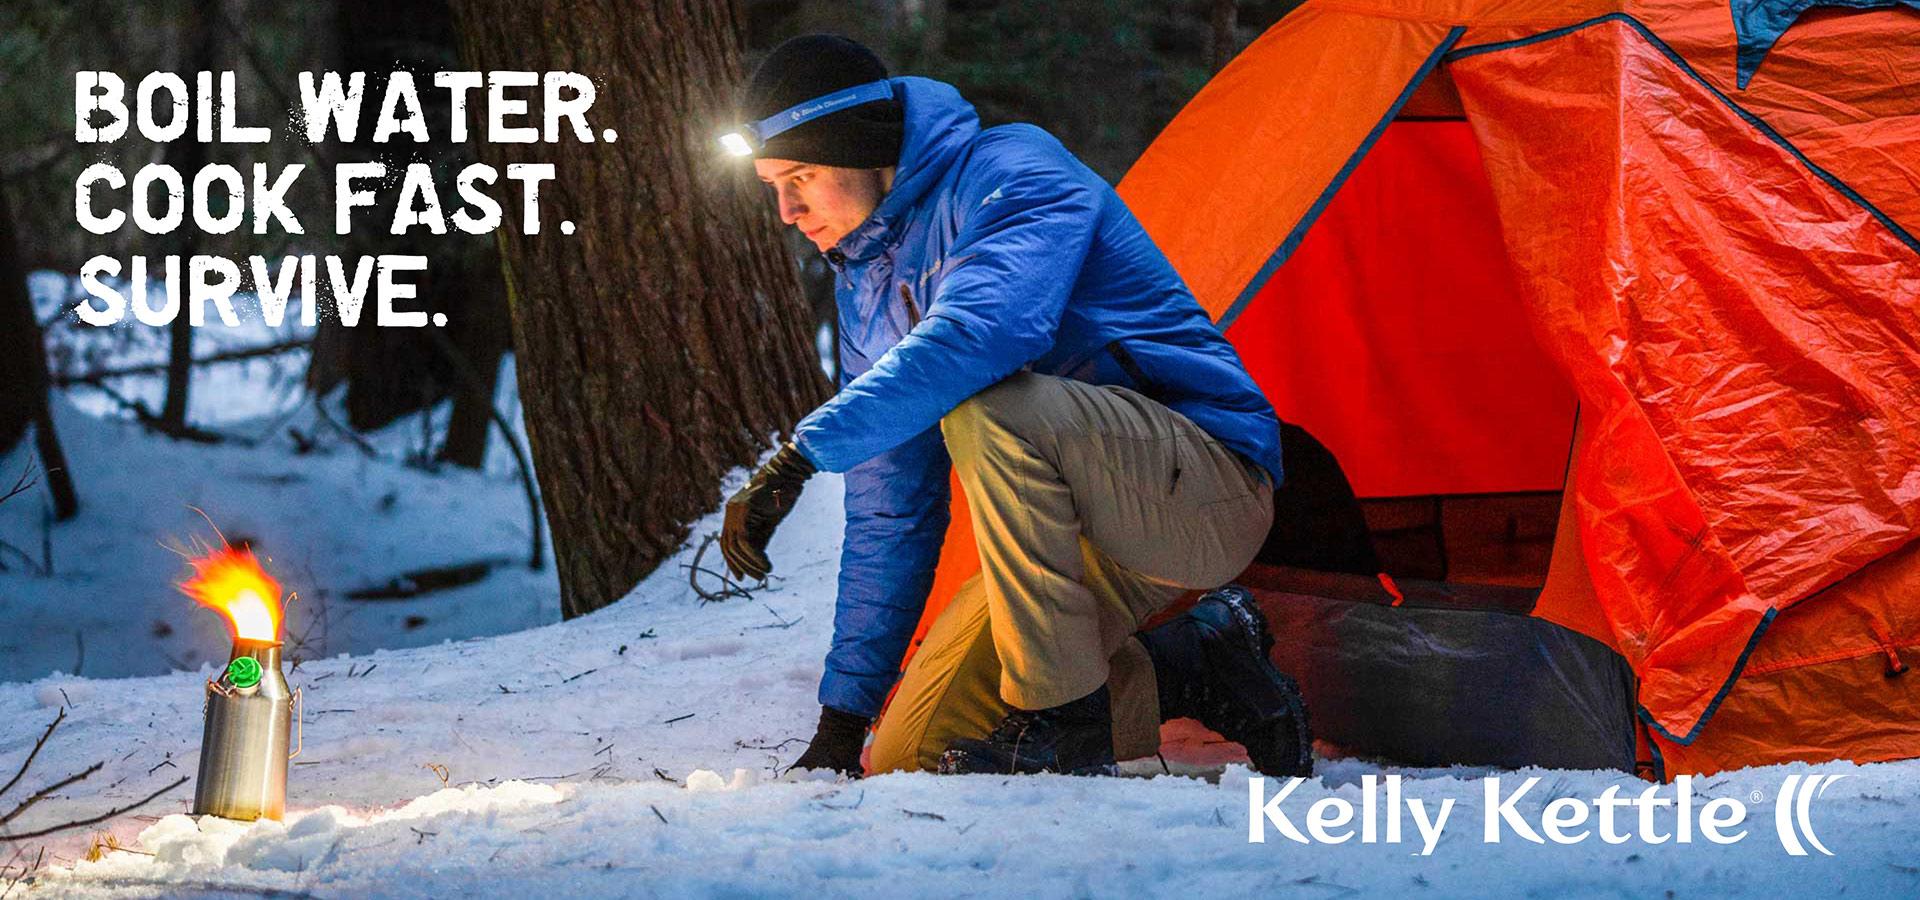 Kelly Kettle Kits